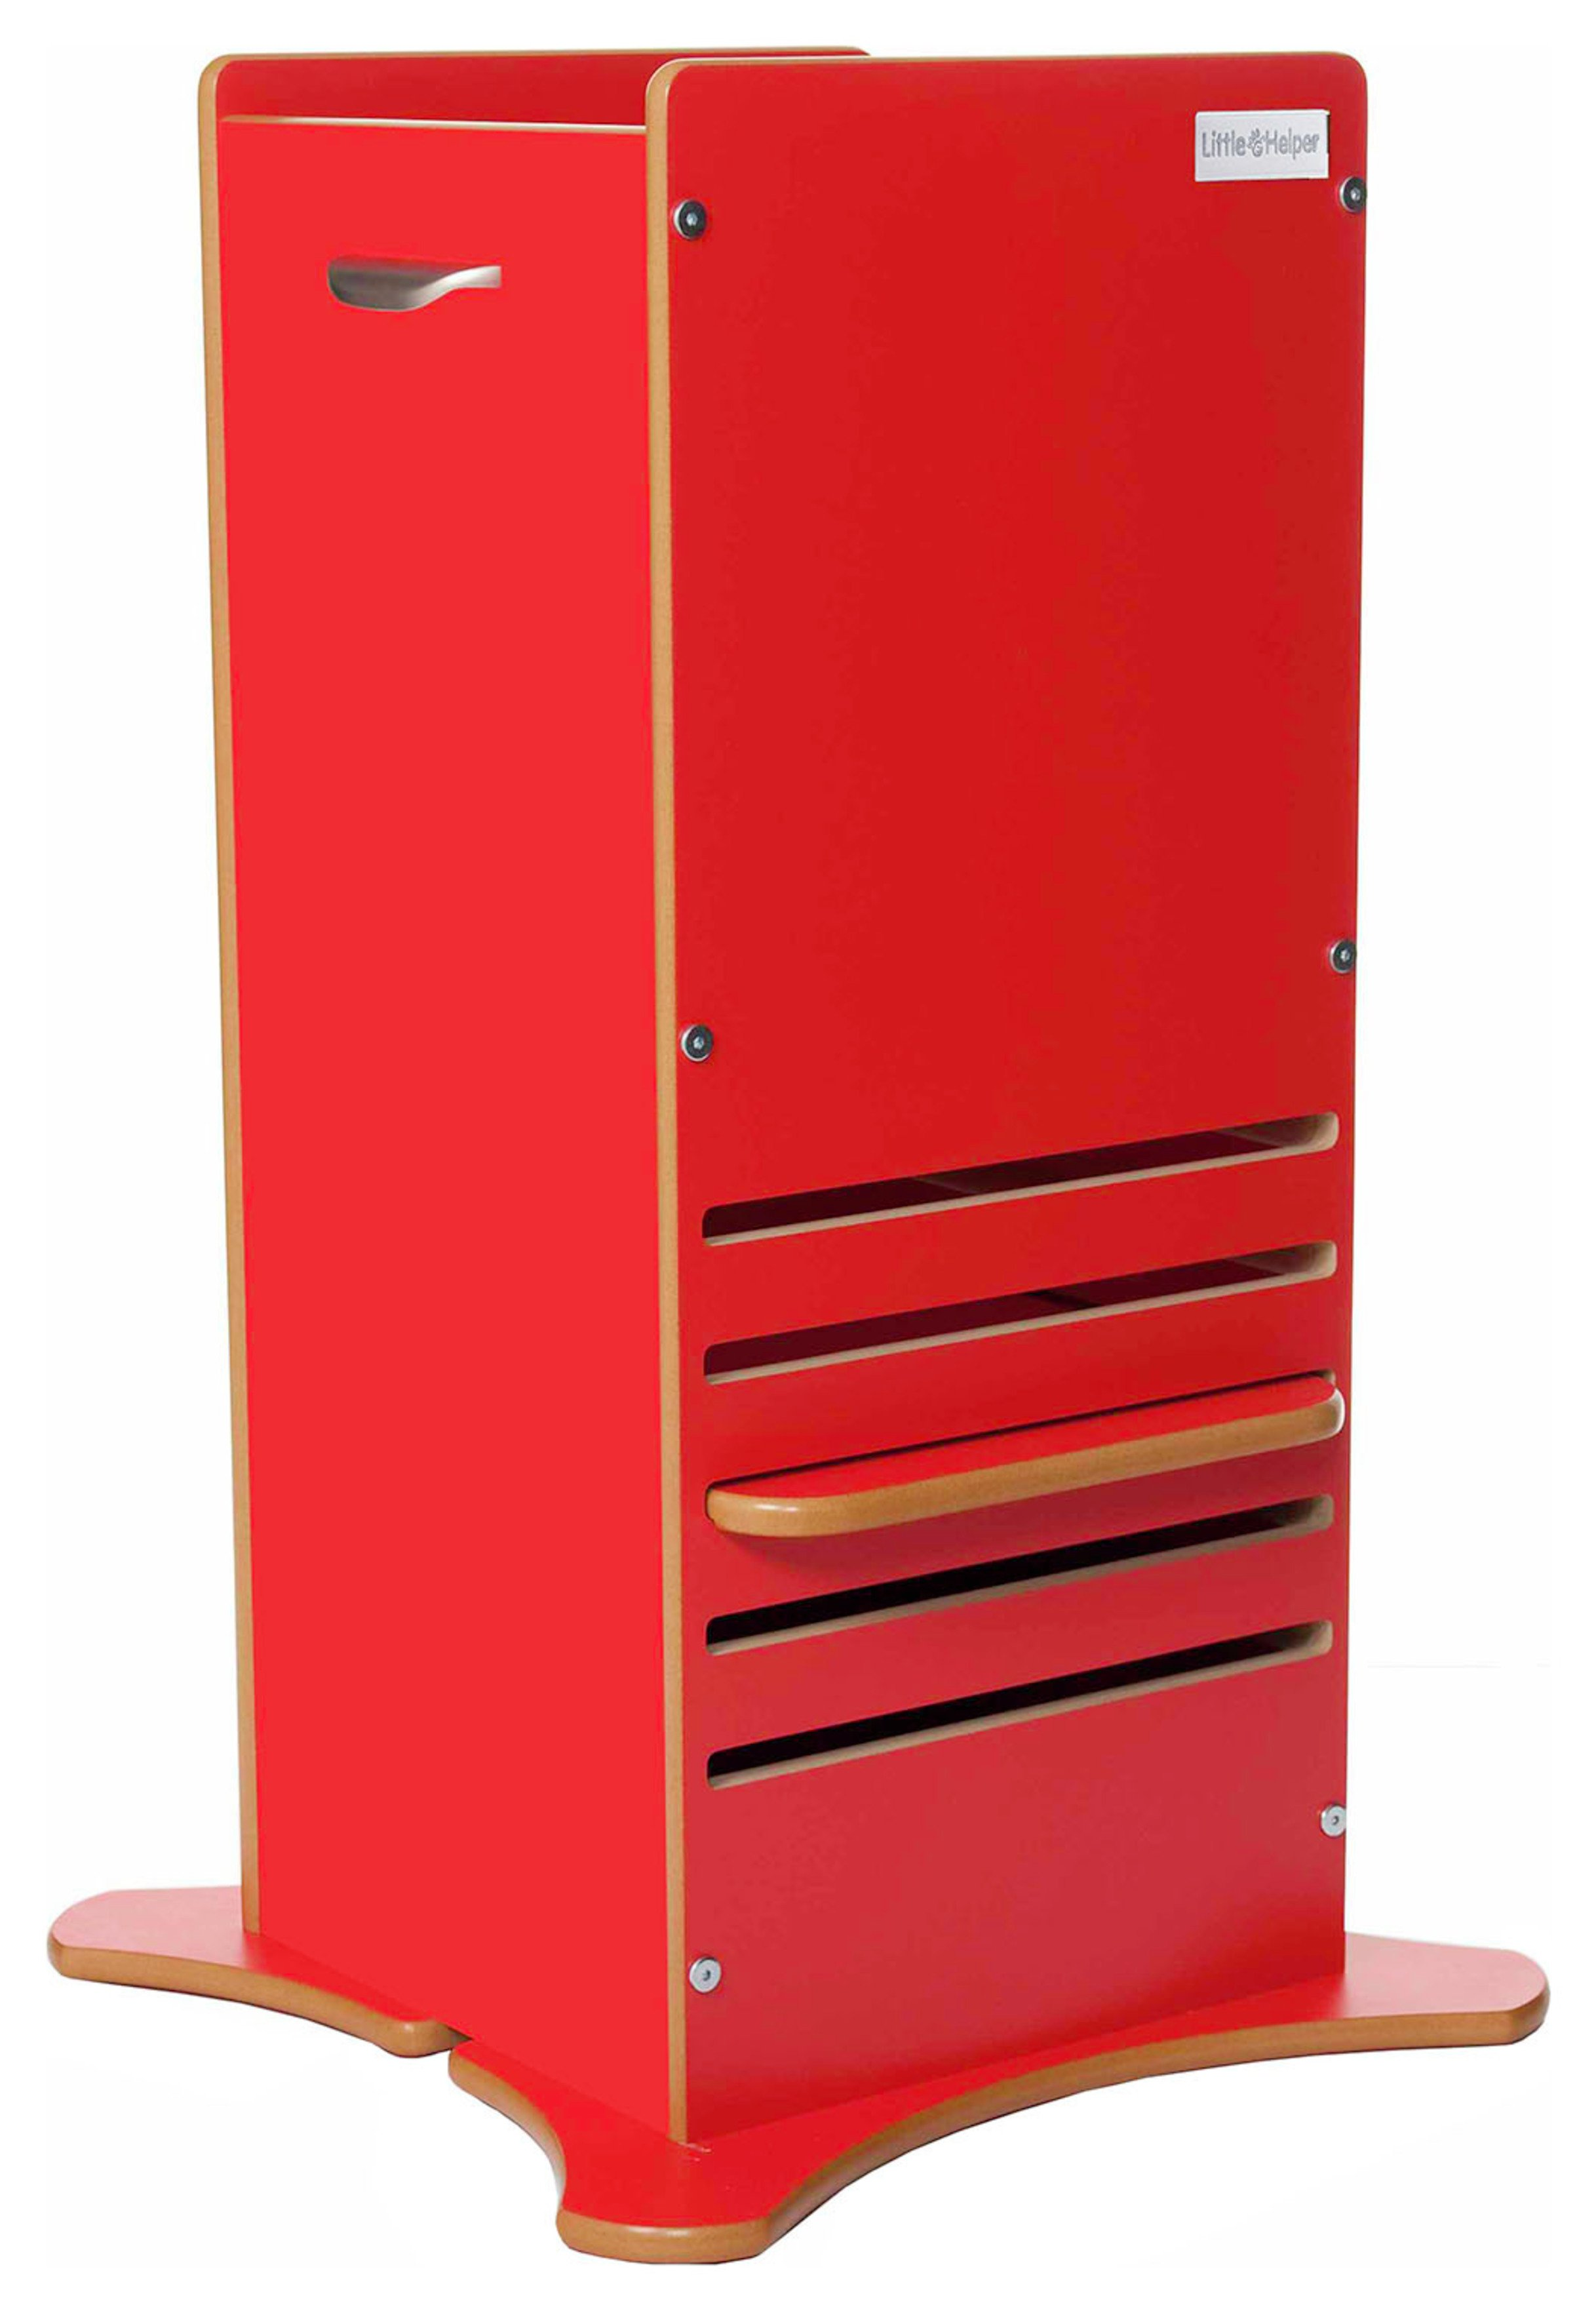 Little Helper FunPod Kitchen Safety Stand - Red